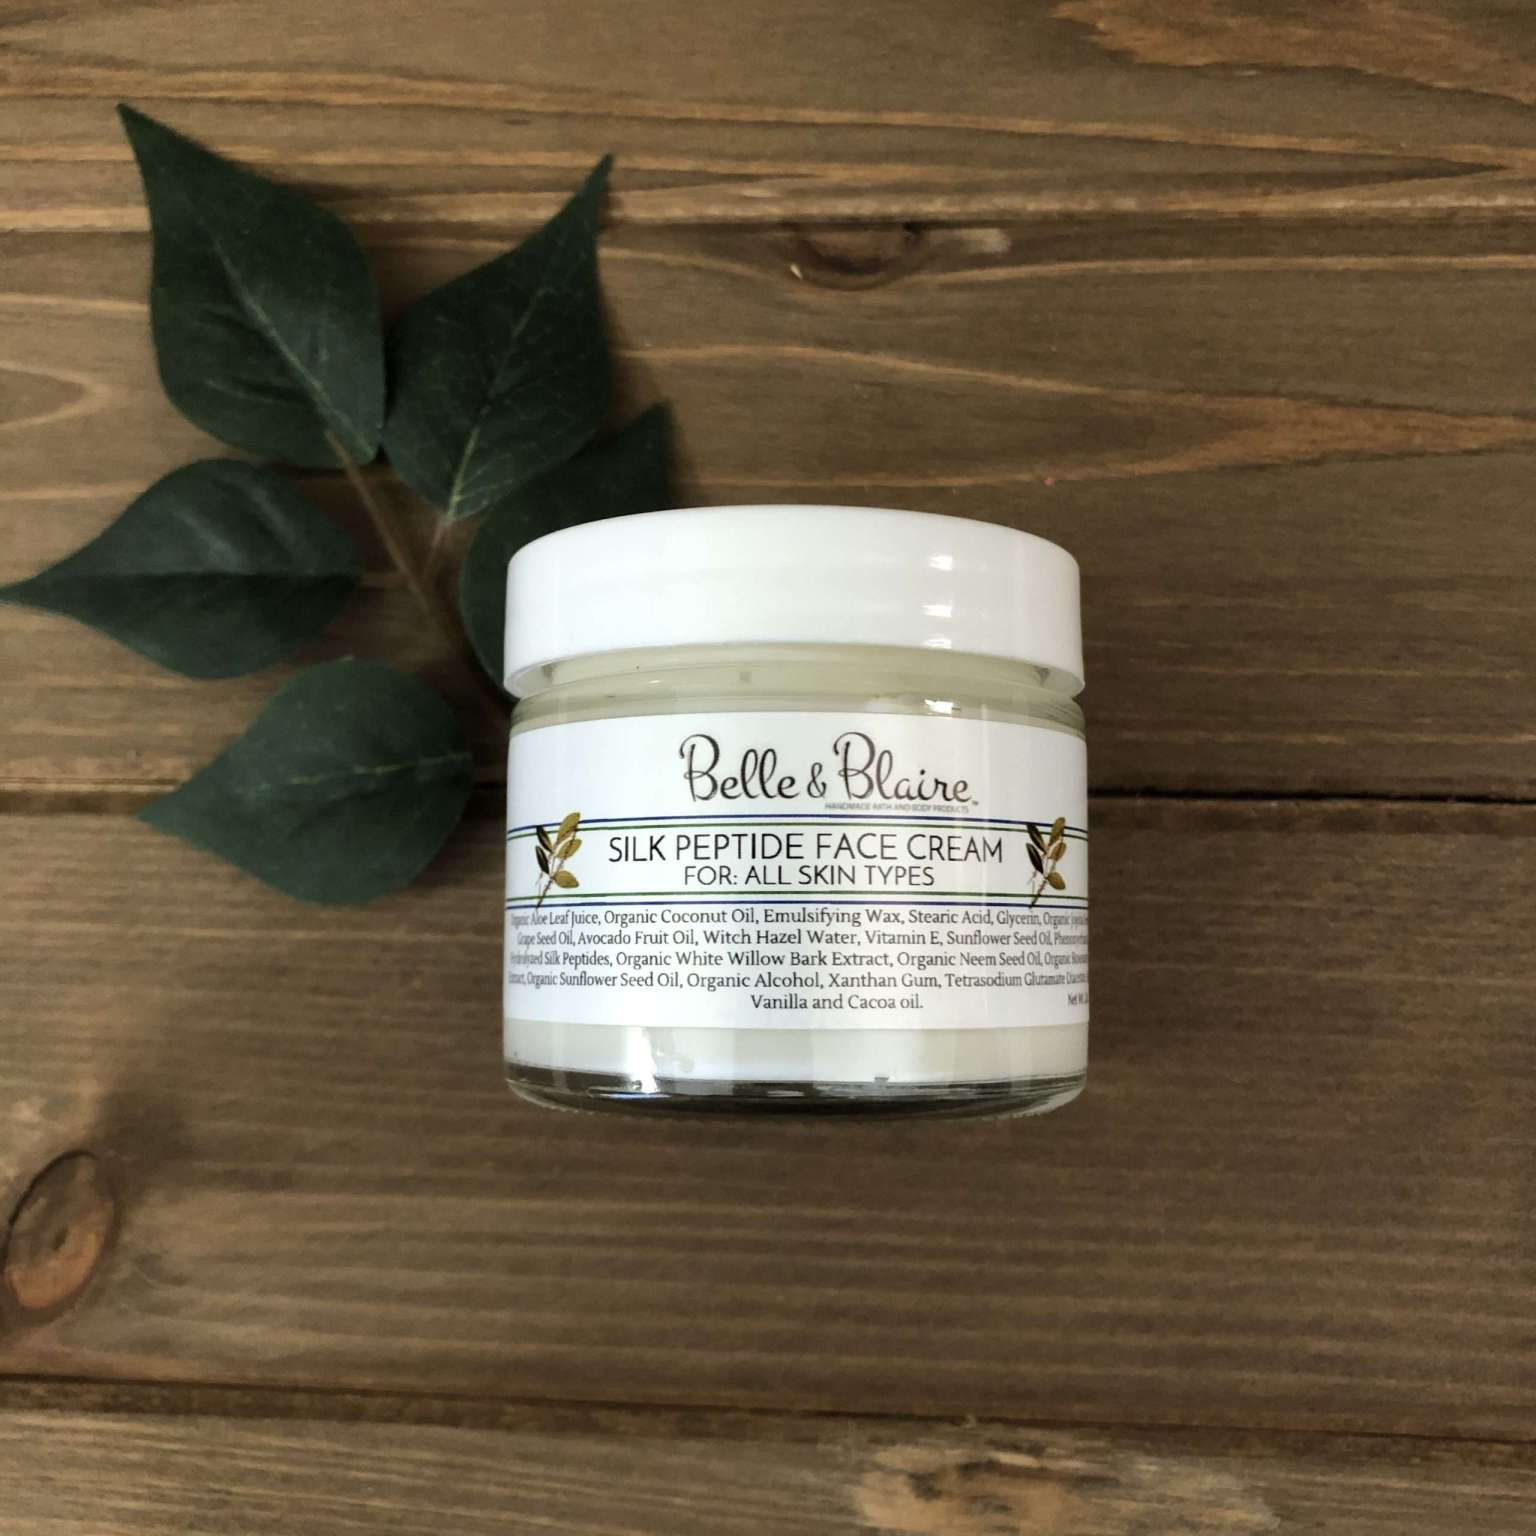 Silk Peptide Face Creme